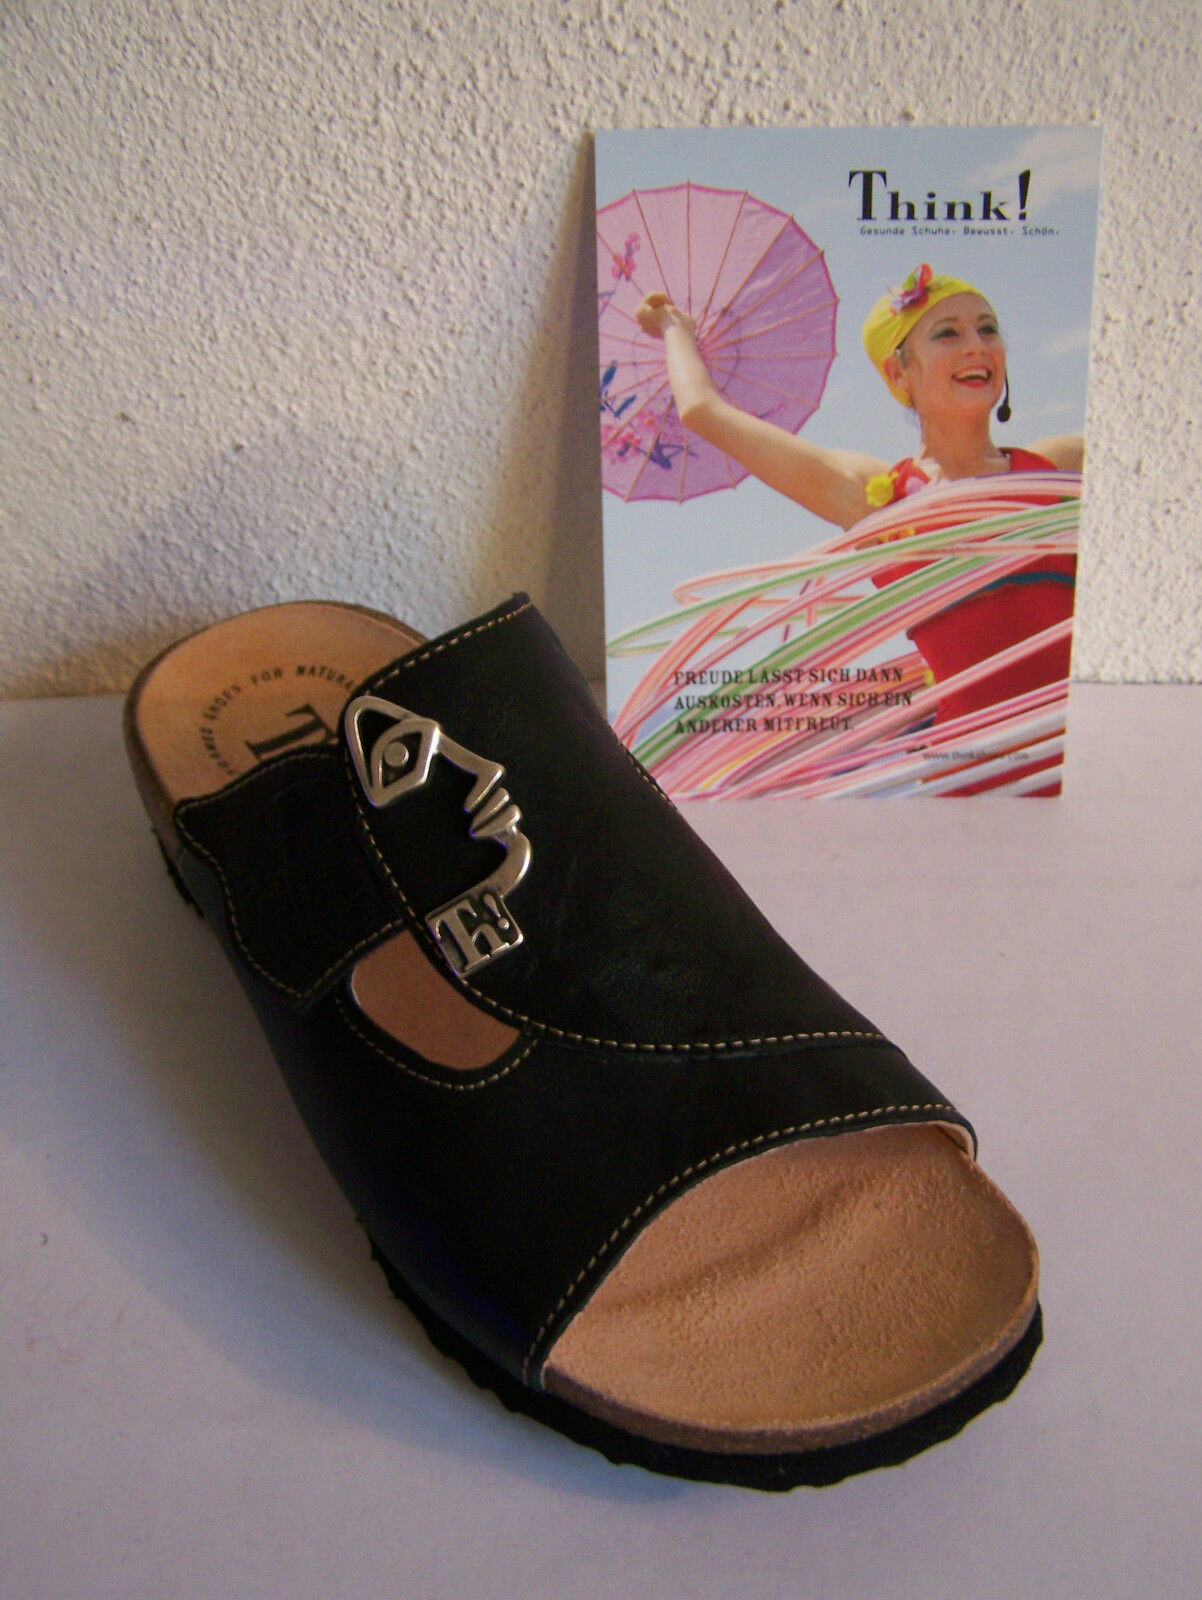 Think   Pantolette Klettverschluß Modell Mizzi schwarz  Klettverschluß Pantolette incl. Baumwollbeutel 39227f